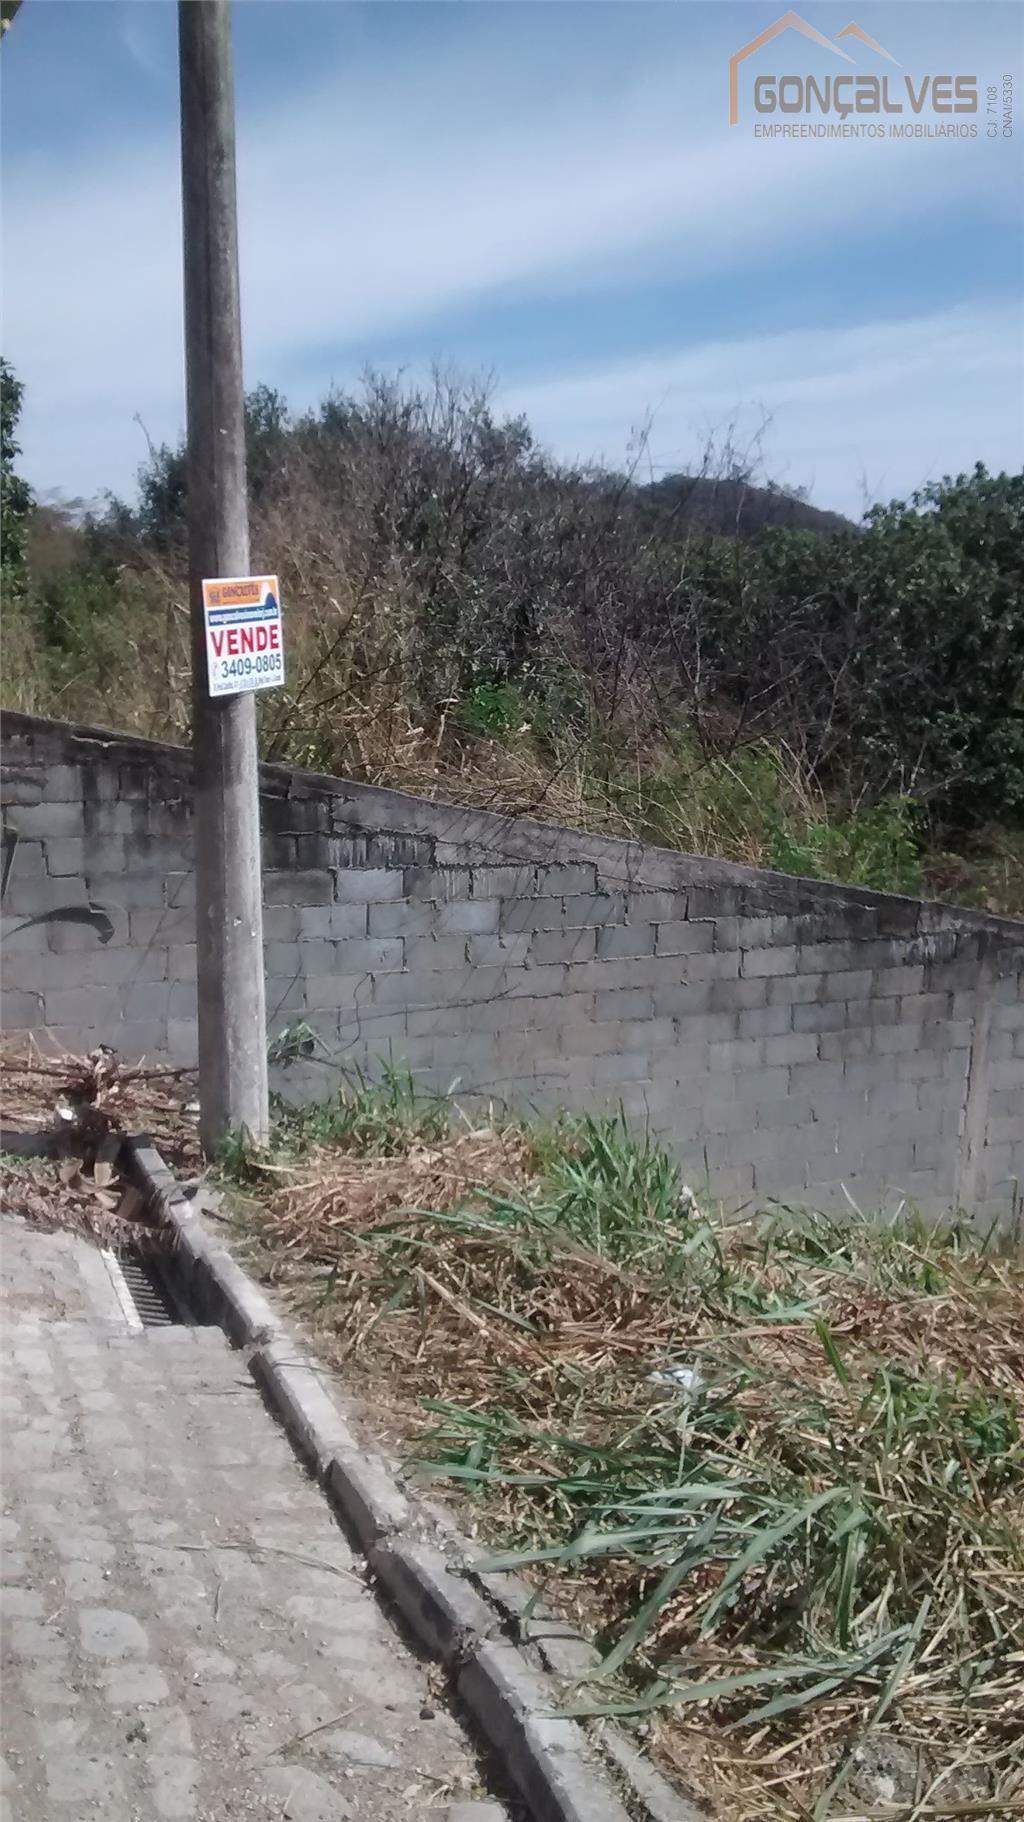 Terreno rural em condomínio fechado. Próx. Parkshopping